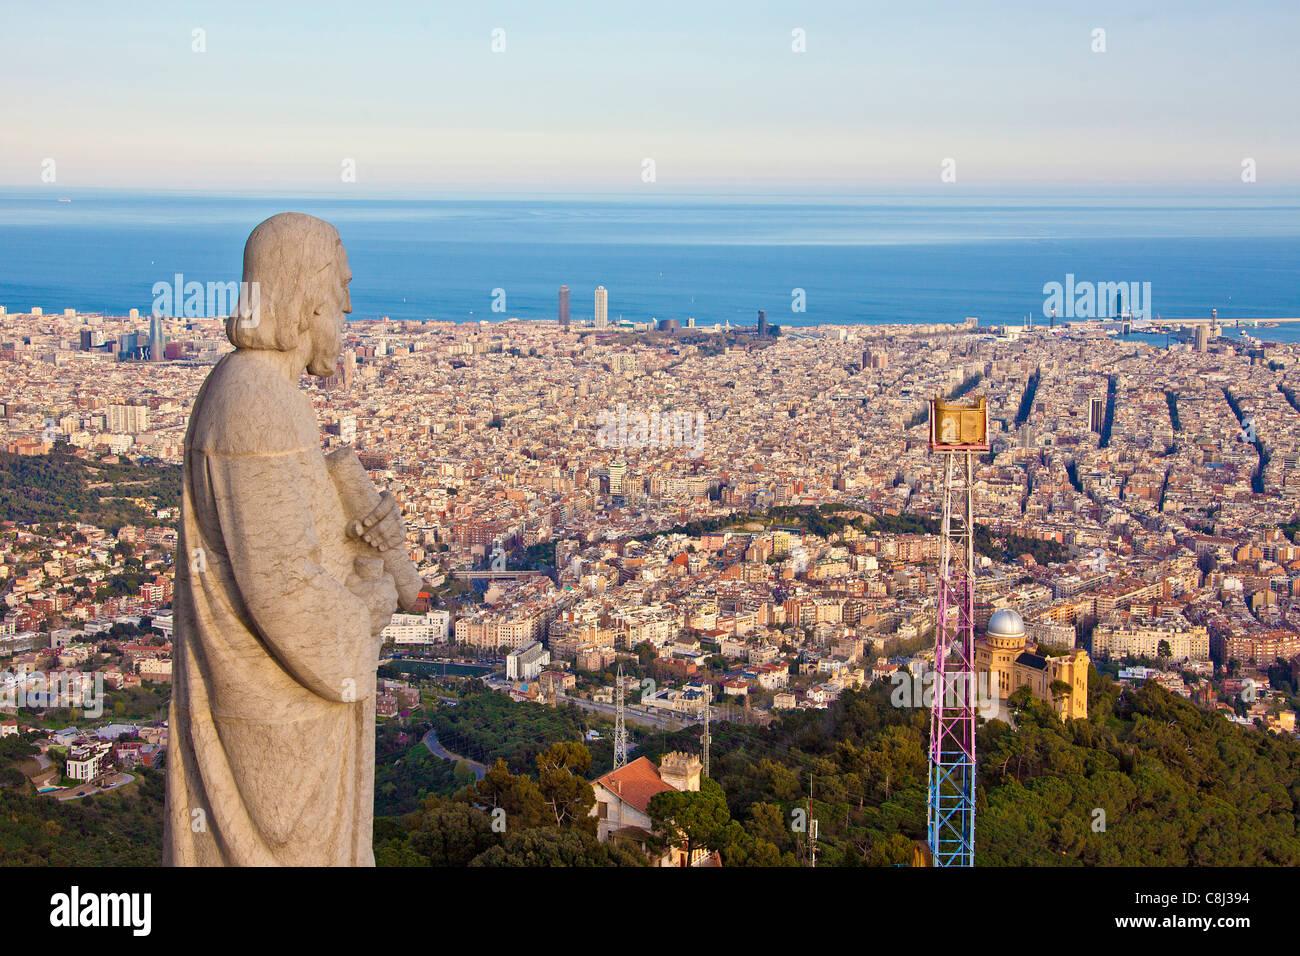 Spain, Europe, Catalunya, Barcelona, city, overview, from Tibidabo, Mountain, statue - Stock Image